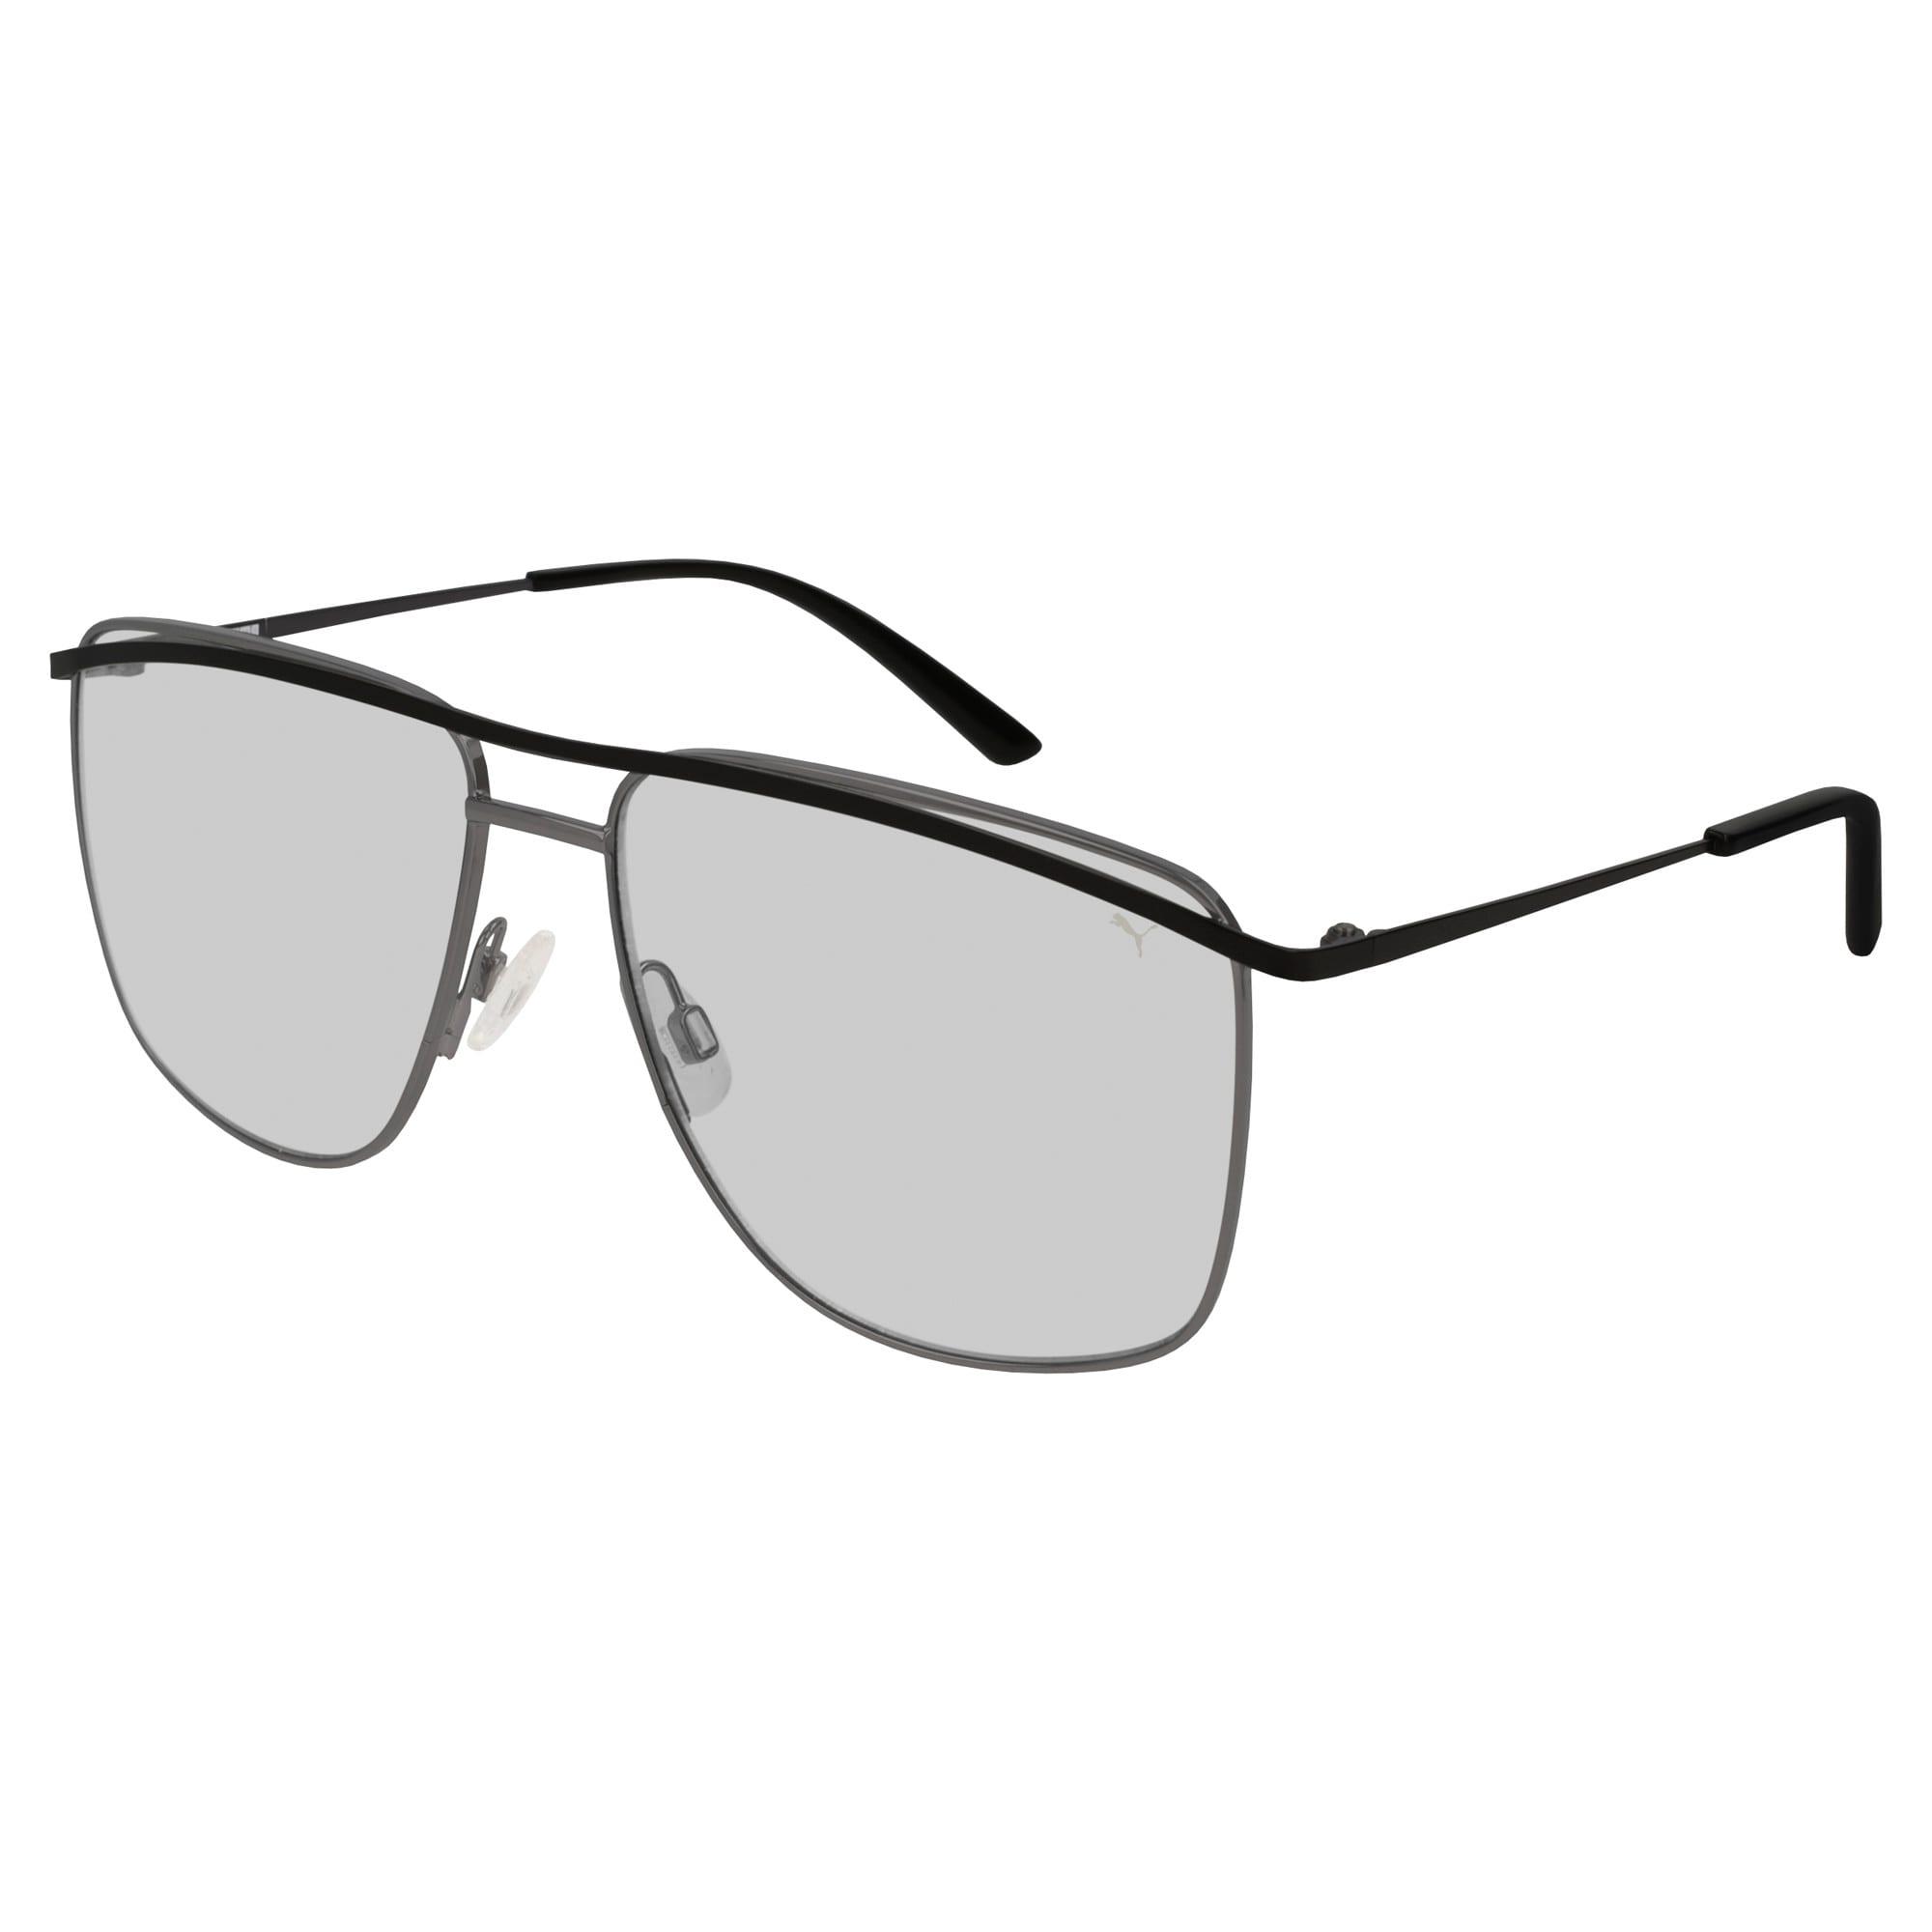 Thumbnail 1 of Sunglasses, BLACK-BLACK-GREY, medium